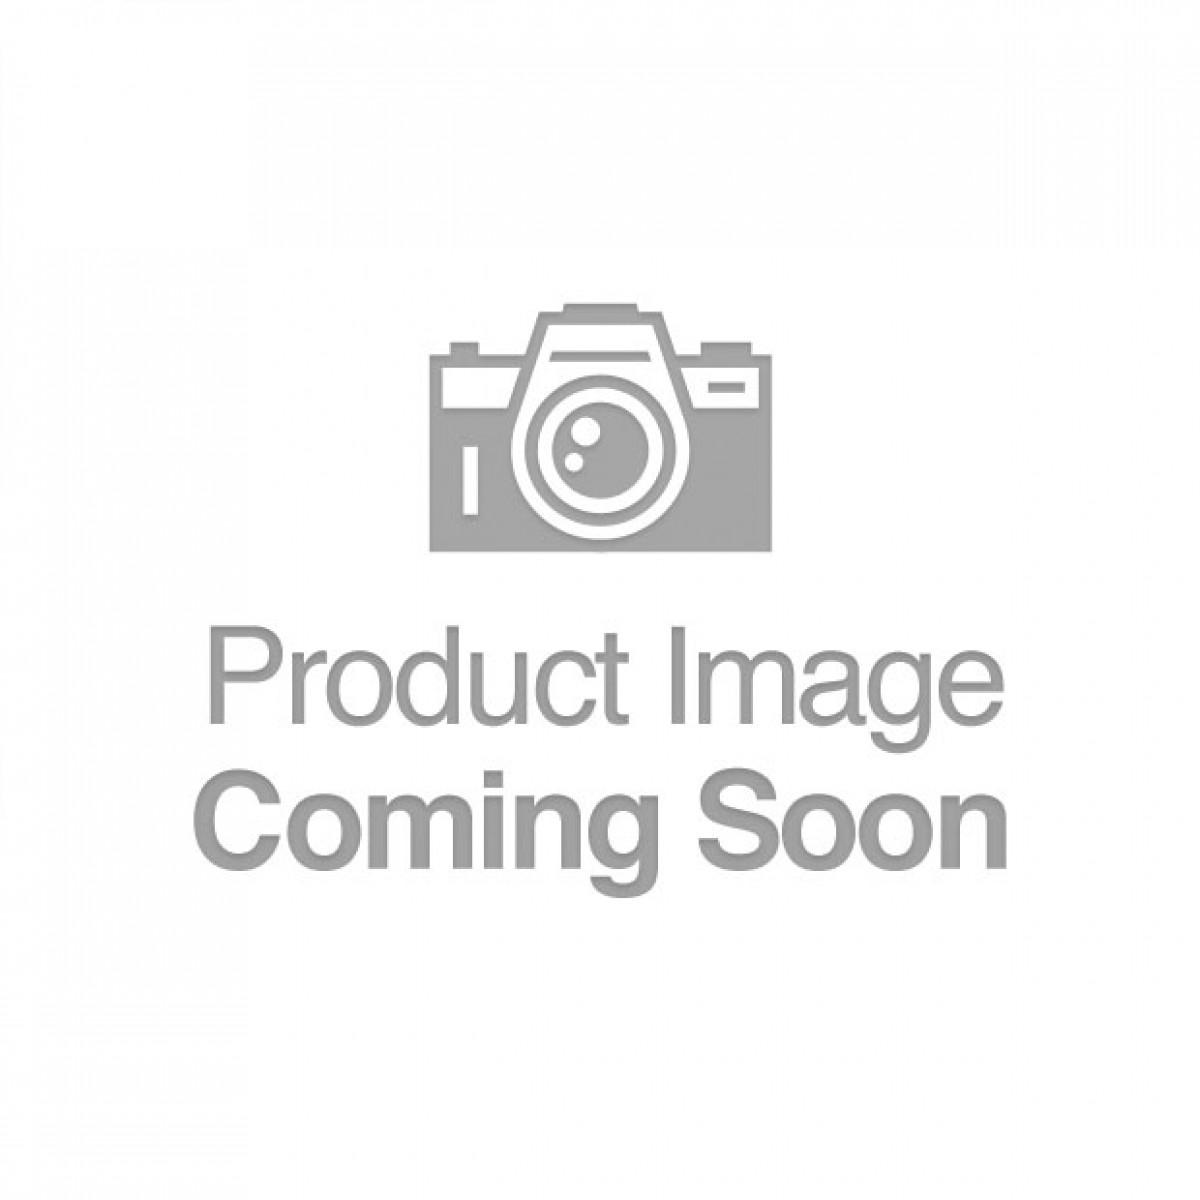 Curve Novelties Gossip G Spot Silicone Wand 50x - Magenta